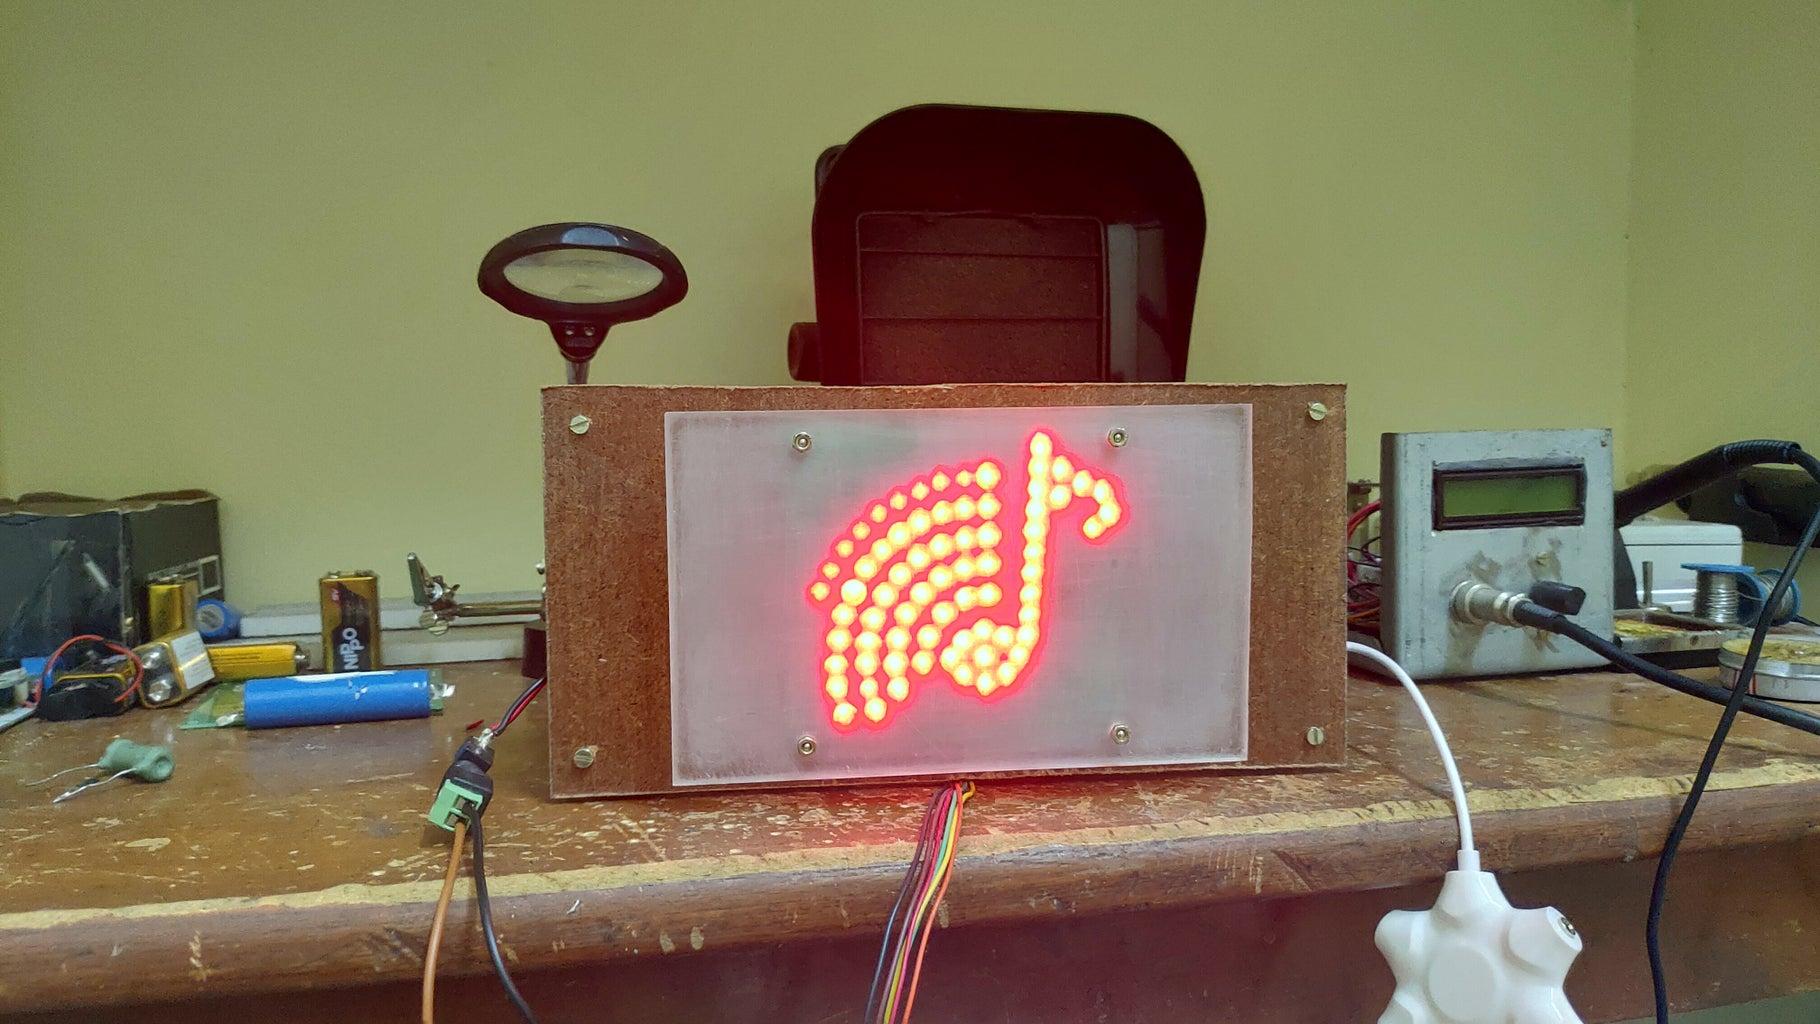 Audio Responsive LED Lights